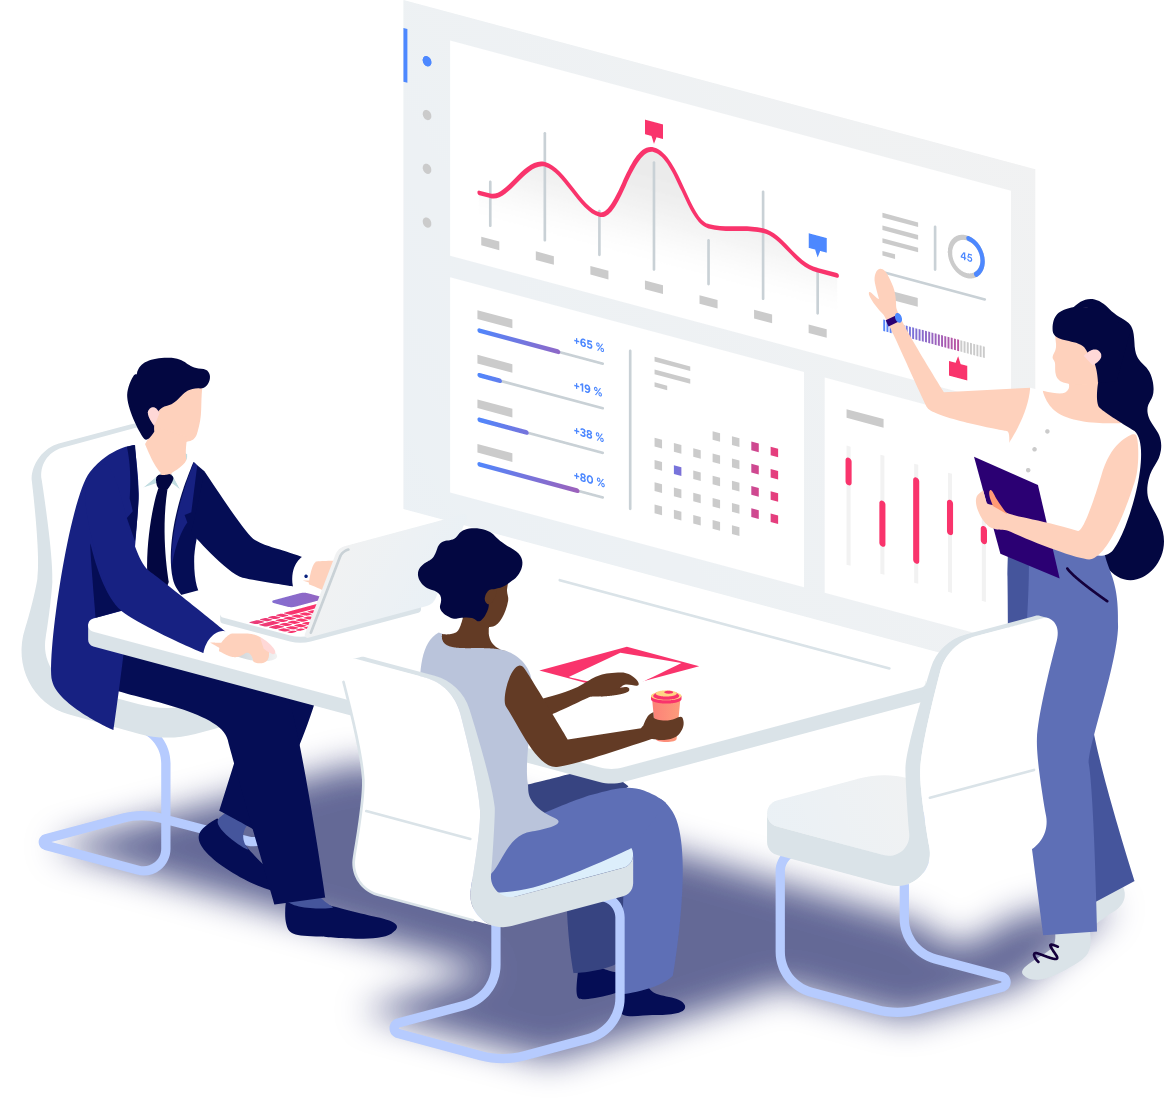 BluePrint Business Intelligence